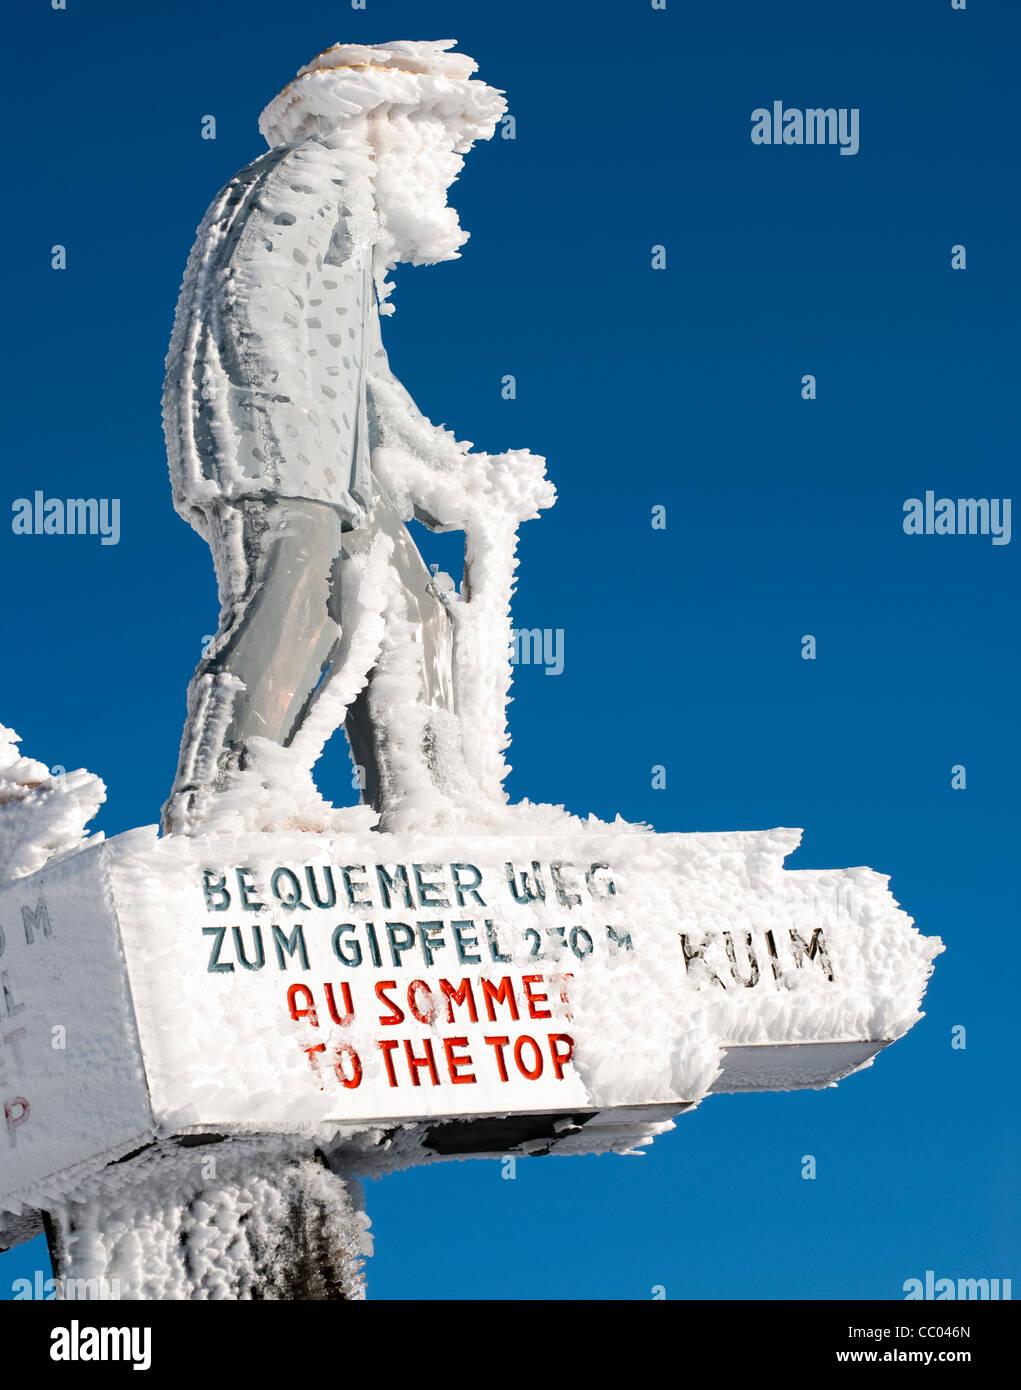 Frozen, snow covered sign post, Mt Rigi, Switzerland Stock Photo